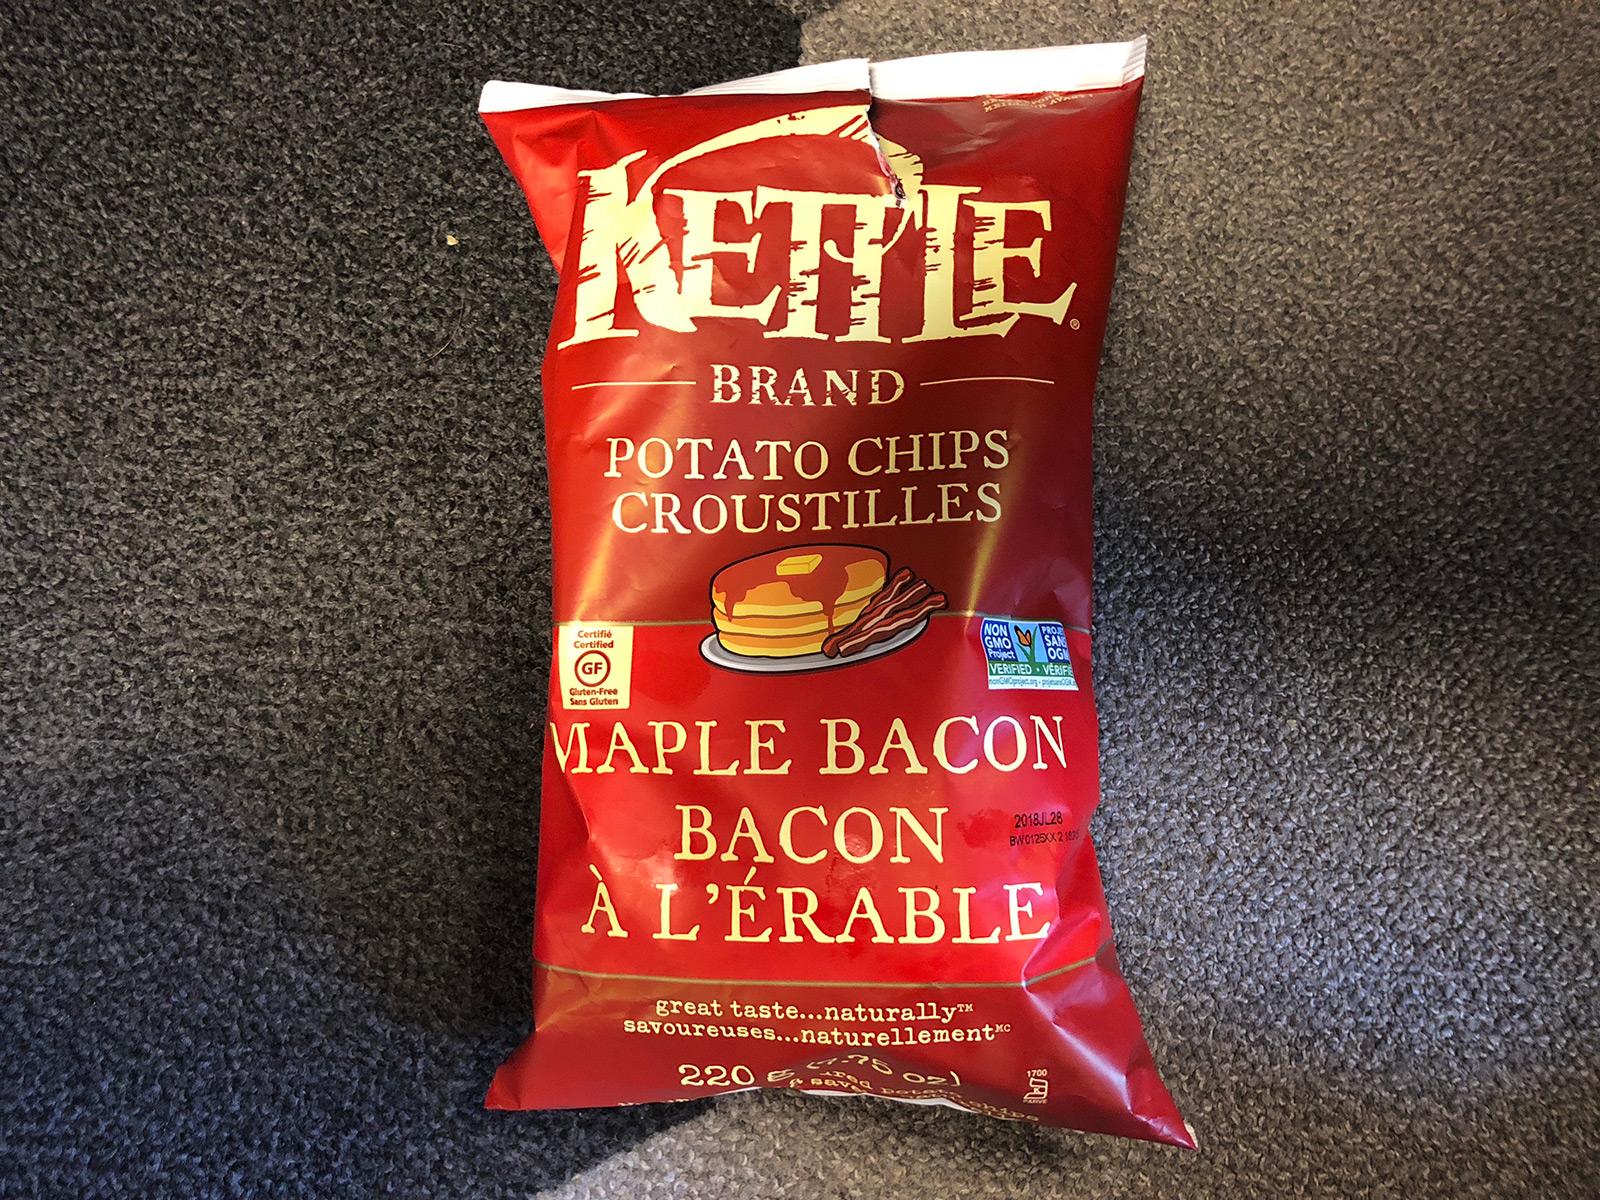 maple-bacon-potato-chips-bag.jpg